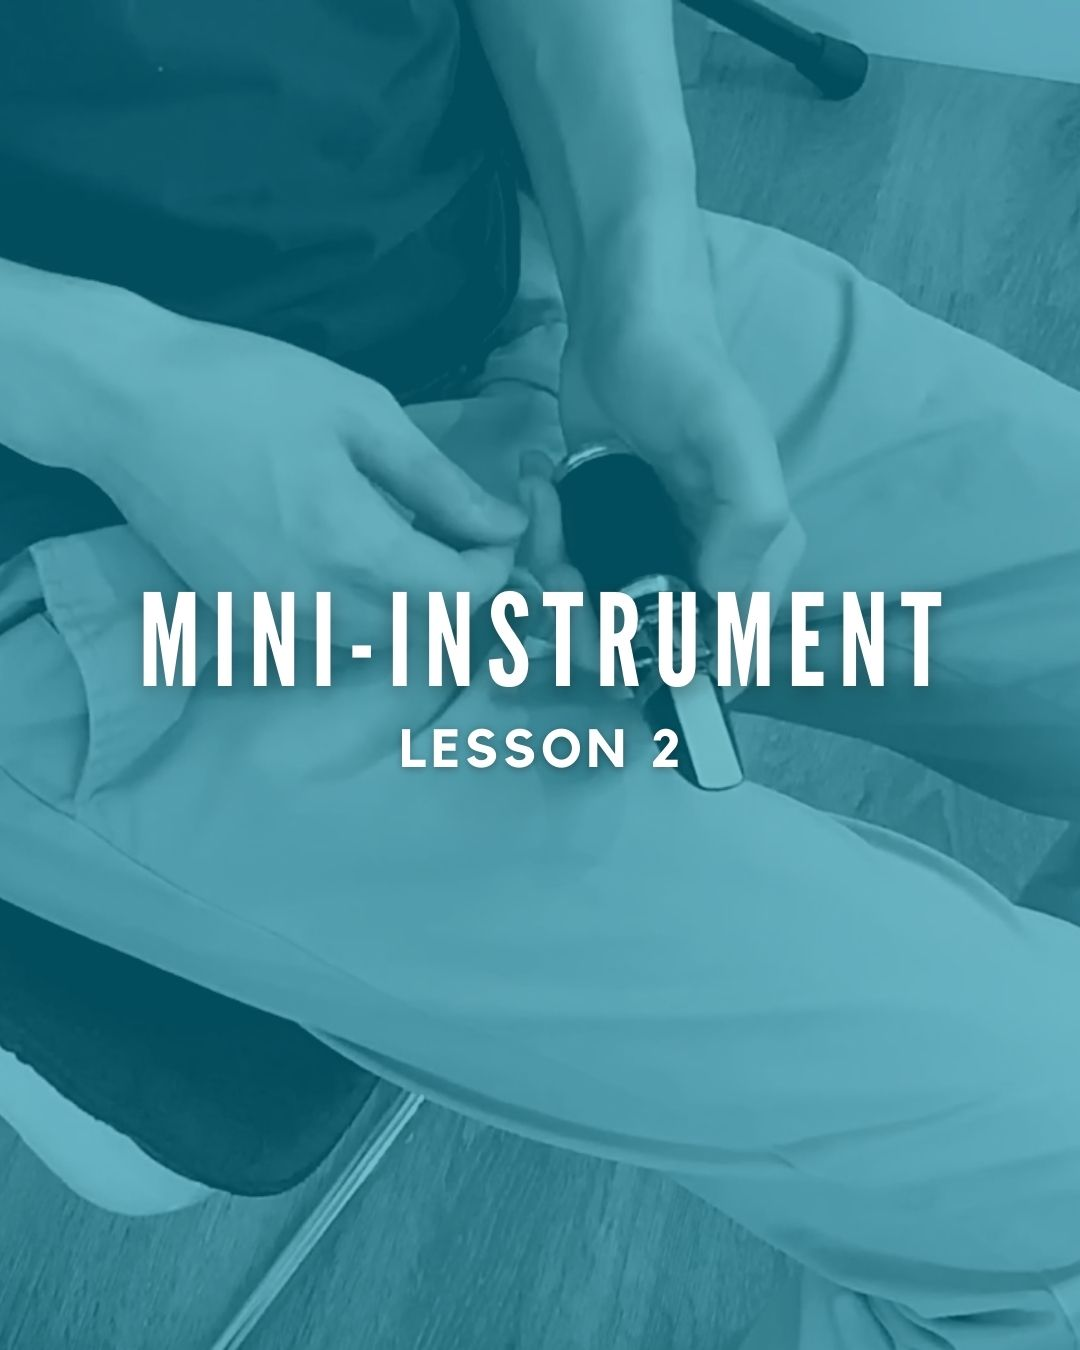 Mini-Instrument